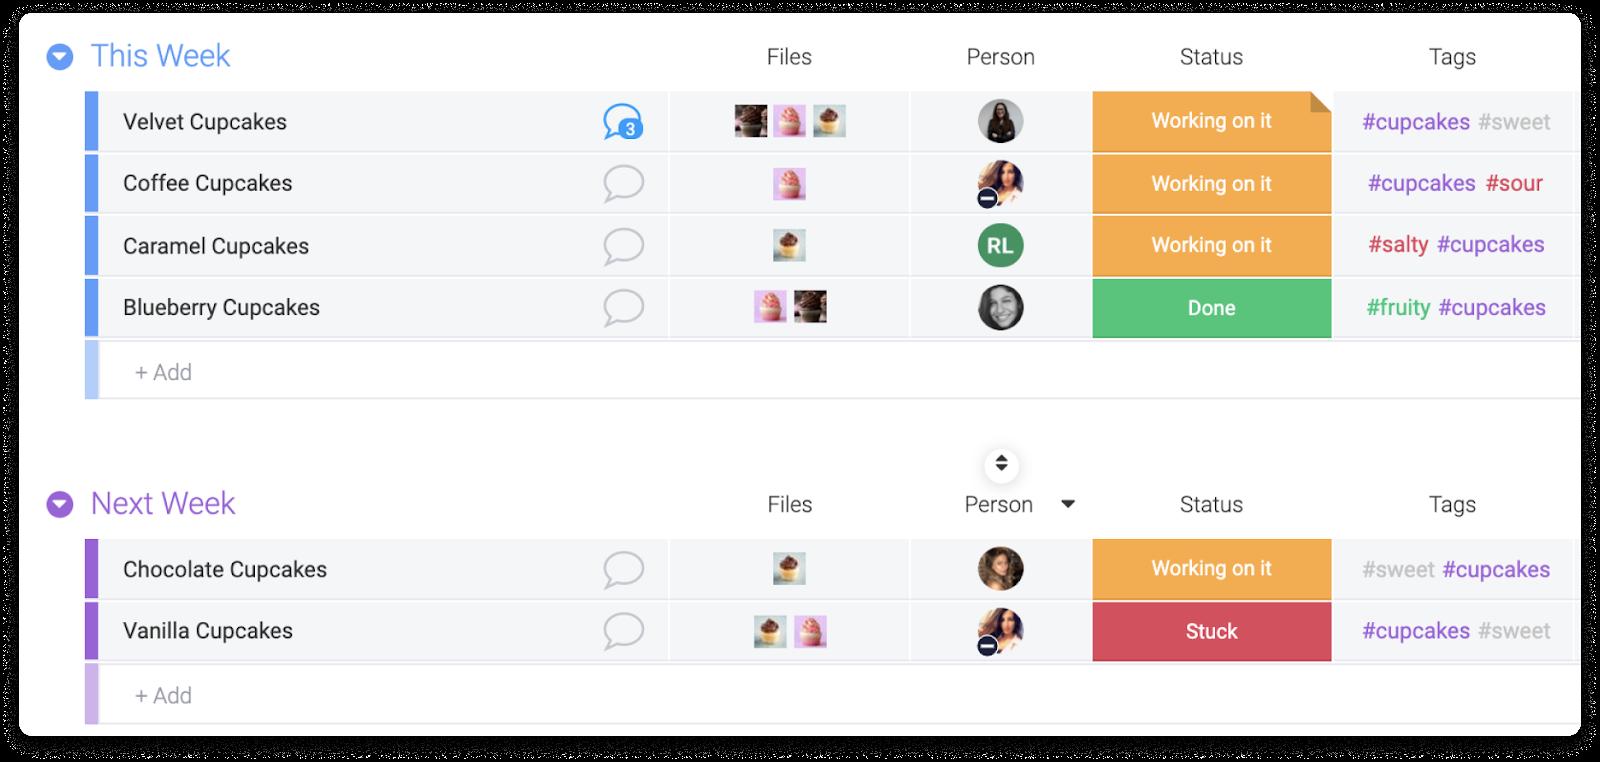 file management monday.com visual display